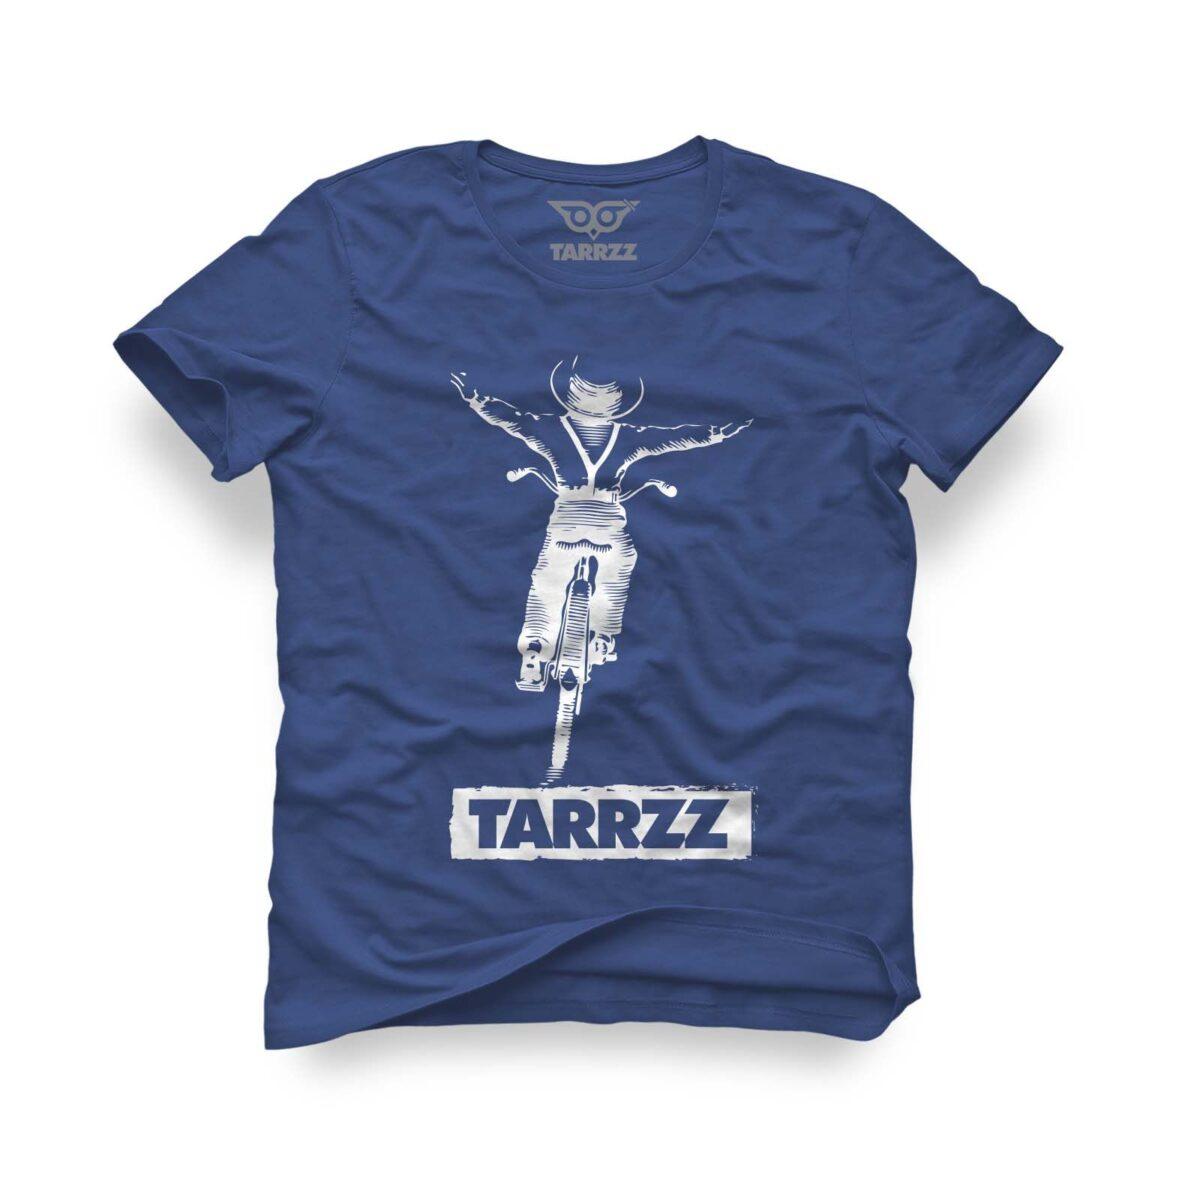 tarrzz-tasarim-marine-mavi-tisort-ozgurce-yasa